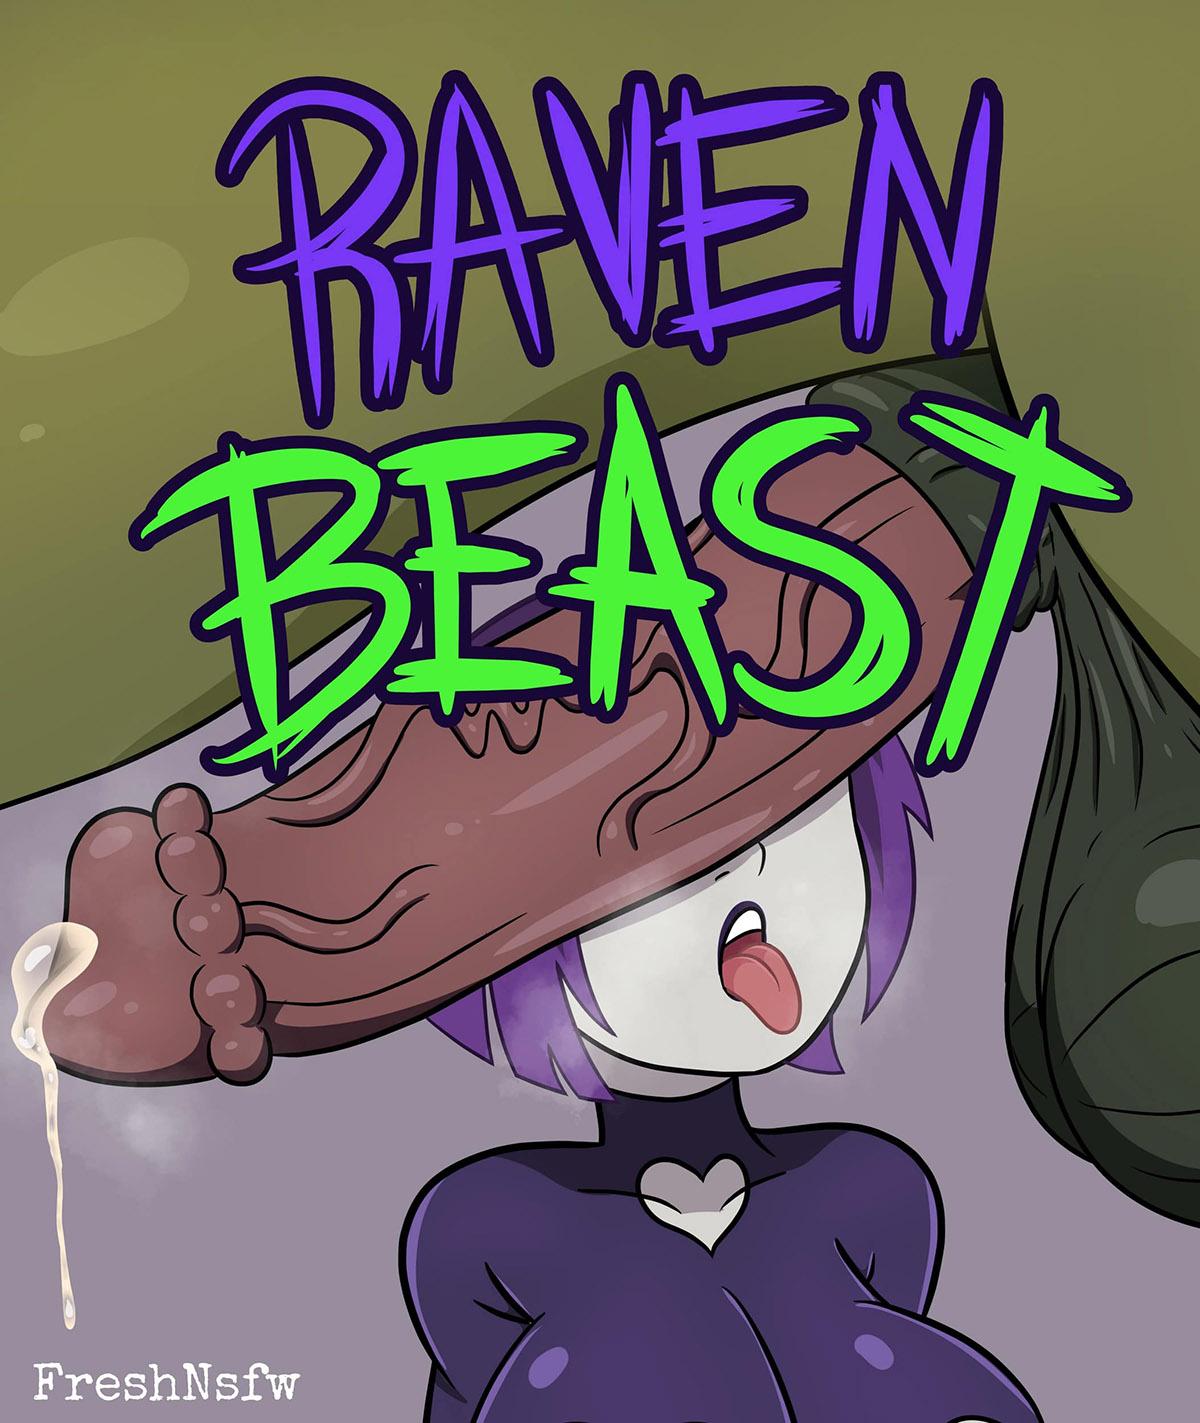 RAVEN BEAST